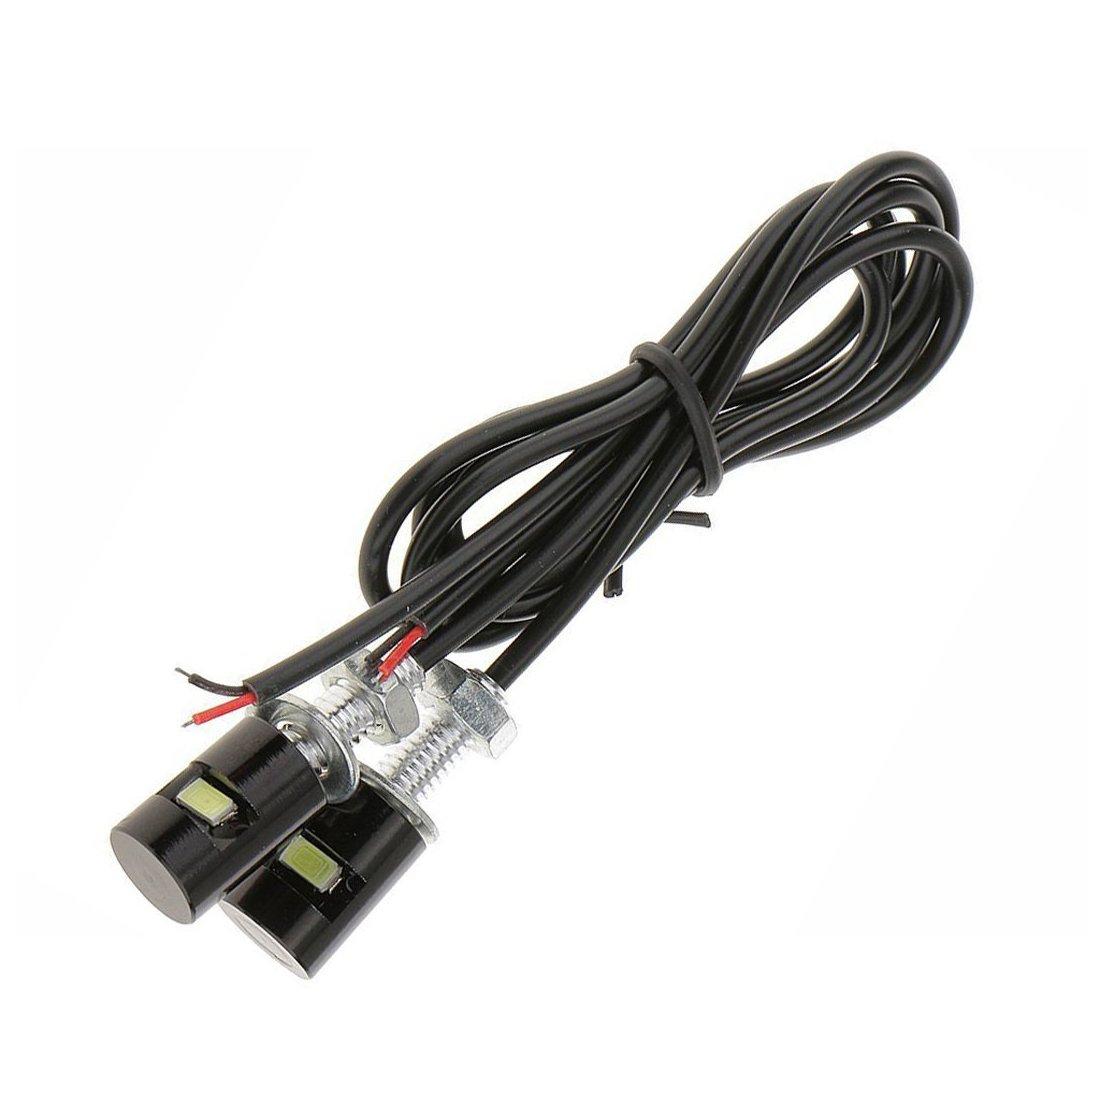 2 x Waterproof Number Plate Lamps Light Bulbs 12V LED Bolt Screw for Motorcycle/Car License Plate Light (White LED Light) Quacc